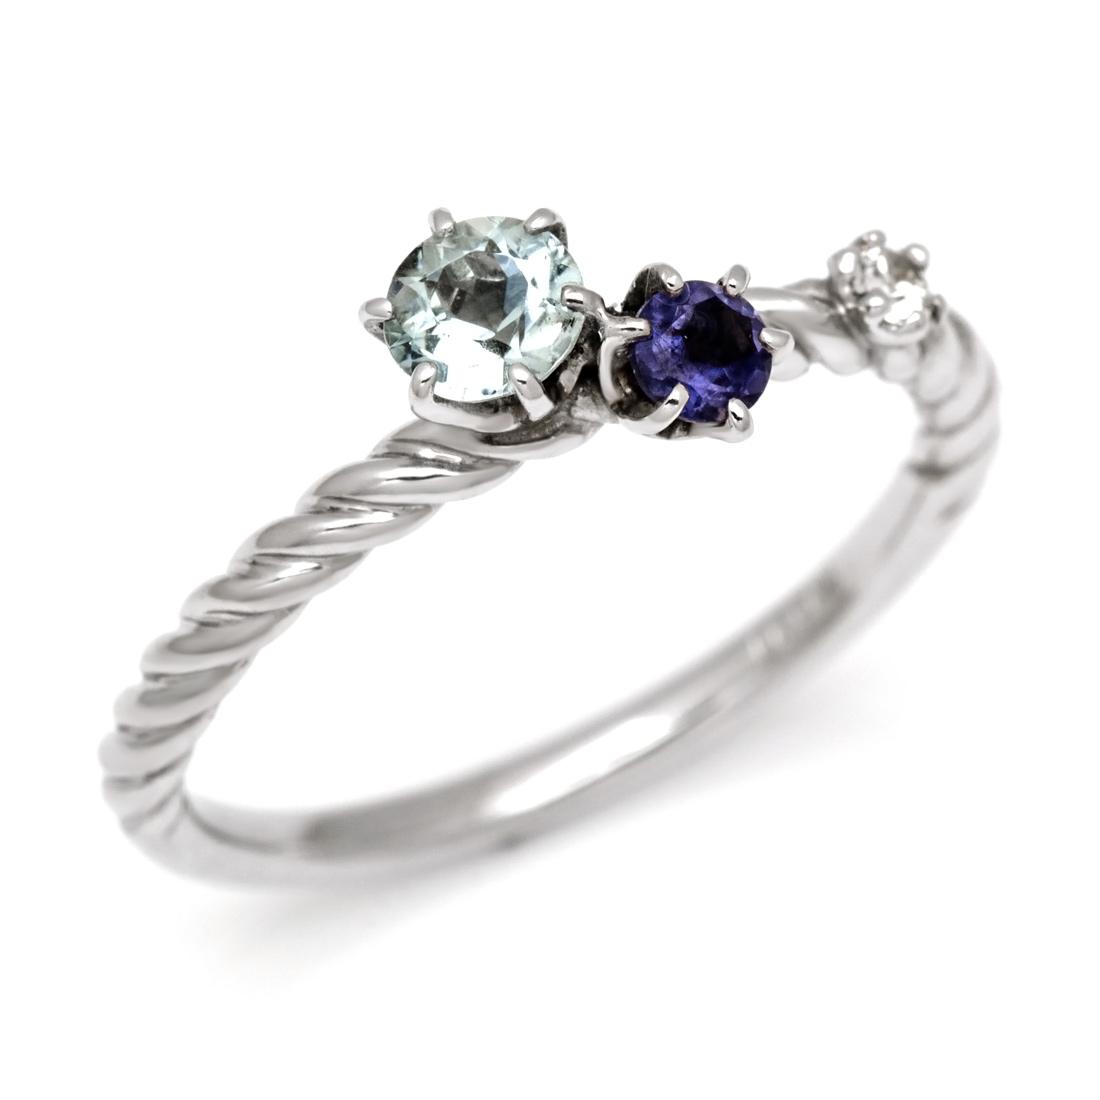 【GWクーポン配布中】リング クールカラー ダイヤモンド 「galassia」 ゴールド K18 送料無料